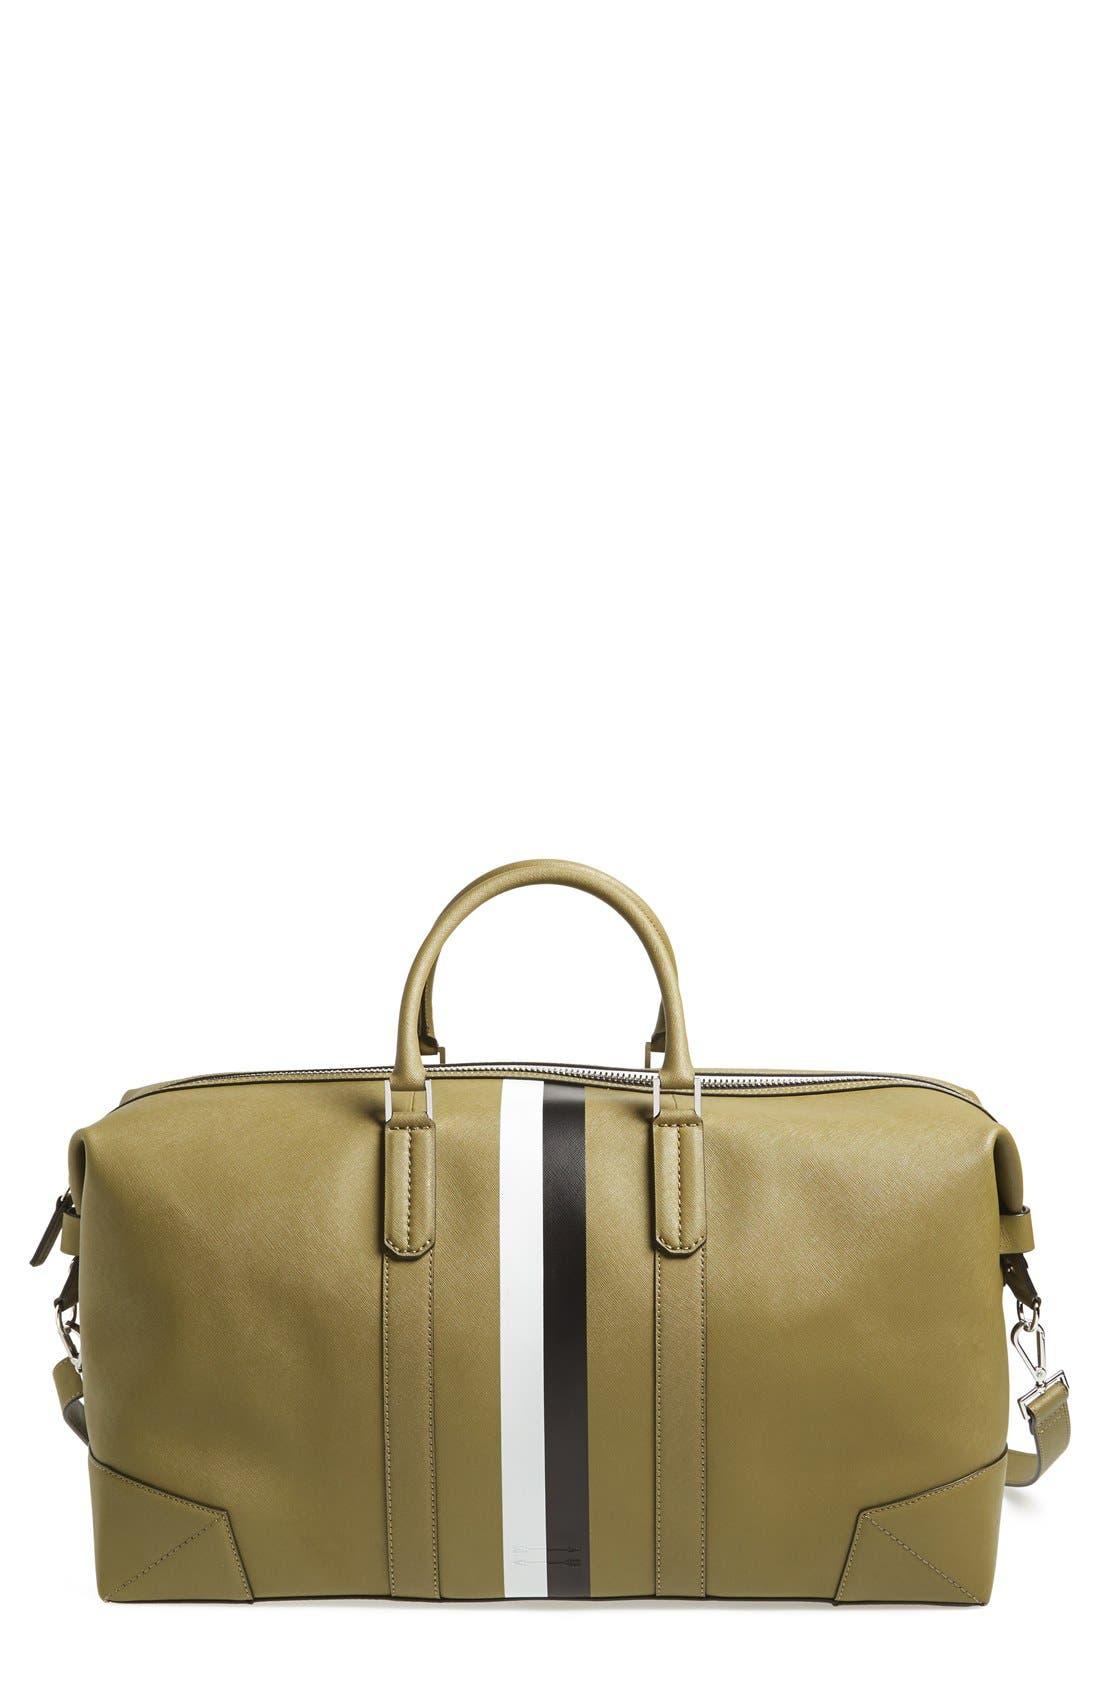 Main Image - Ben Minkoff 'Wythe' Weekend Size Saffiano Leather Duffel Bag